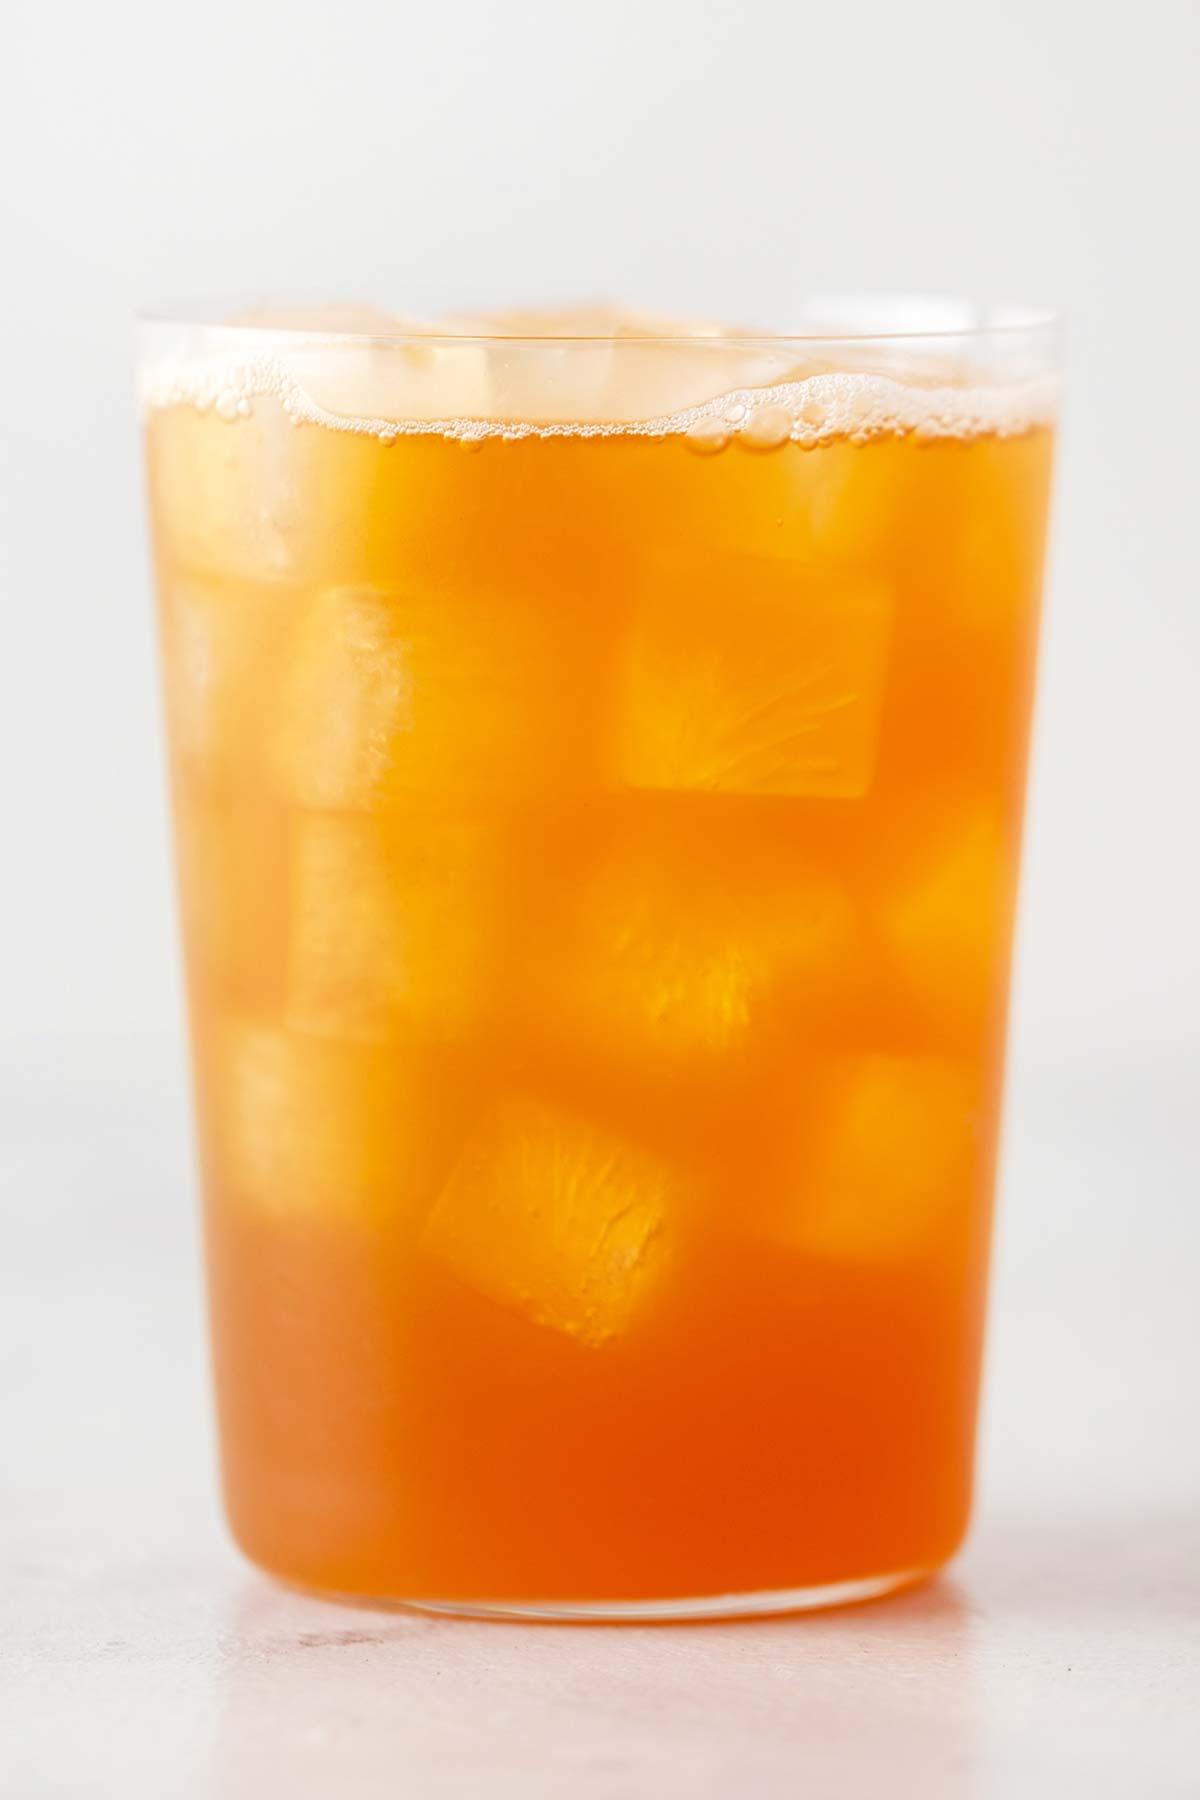 Iced black tea and lemonade recipe.